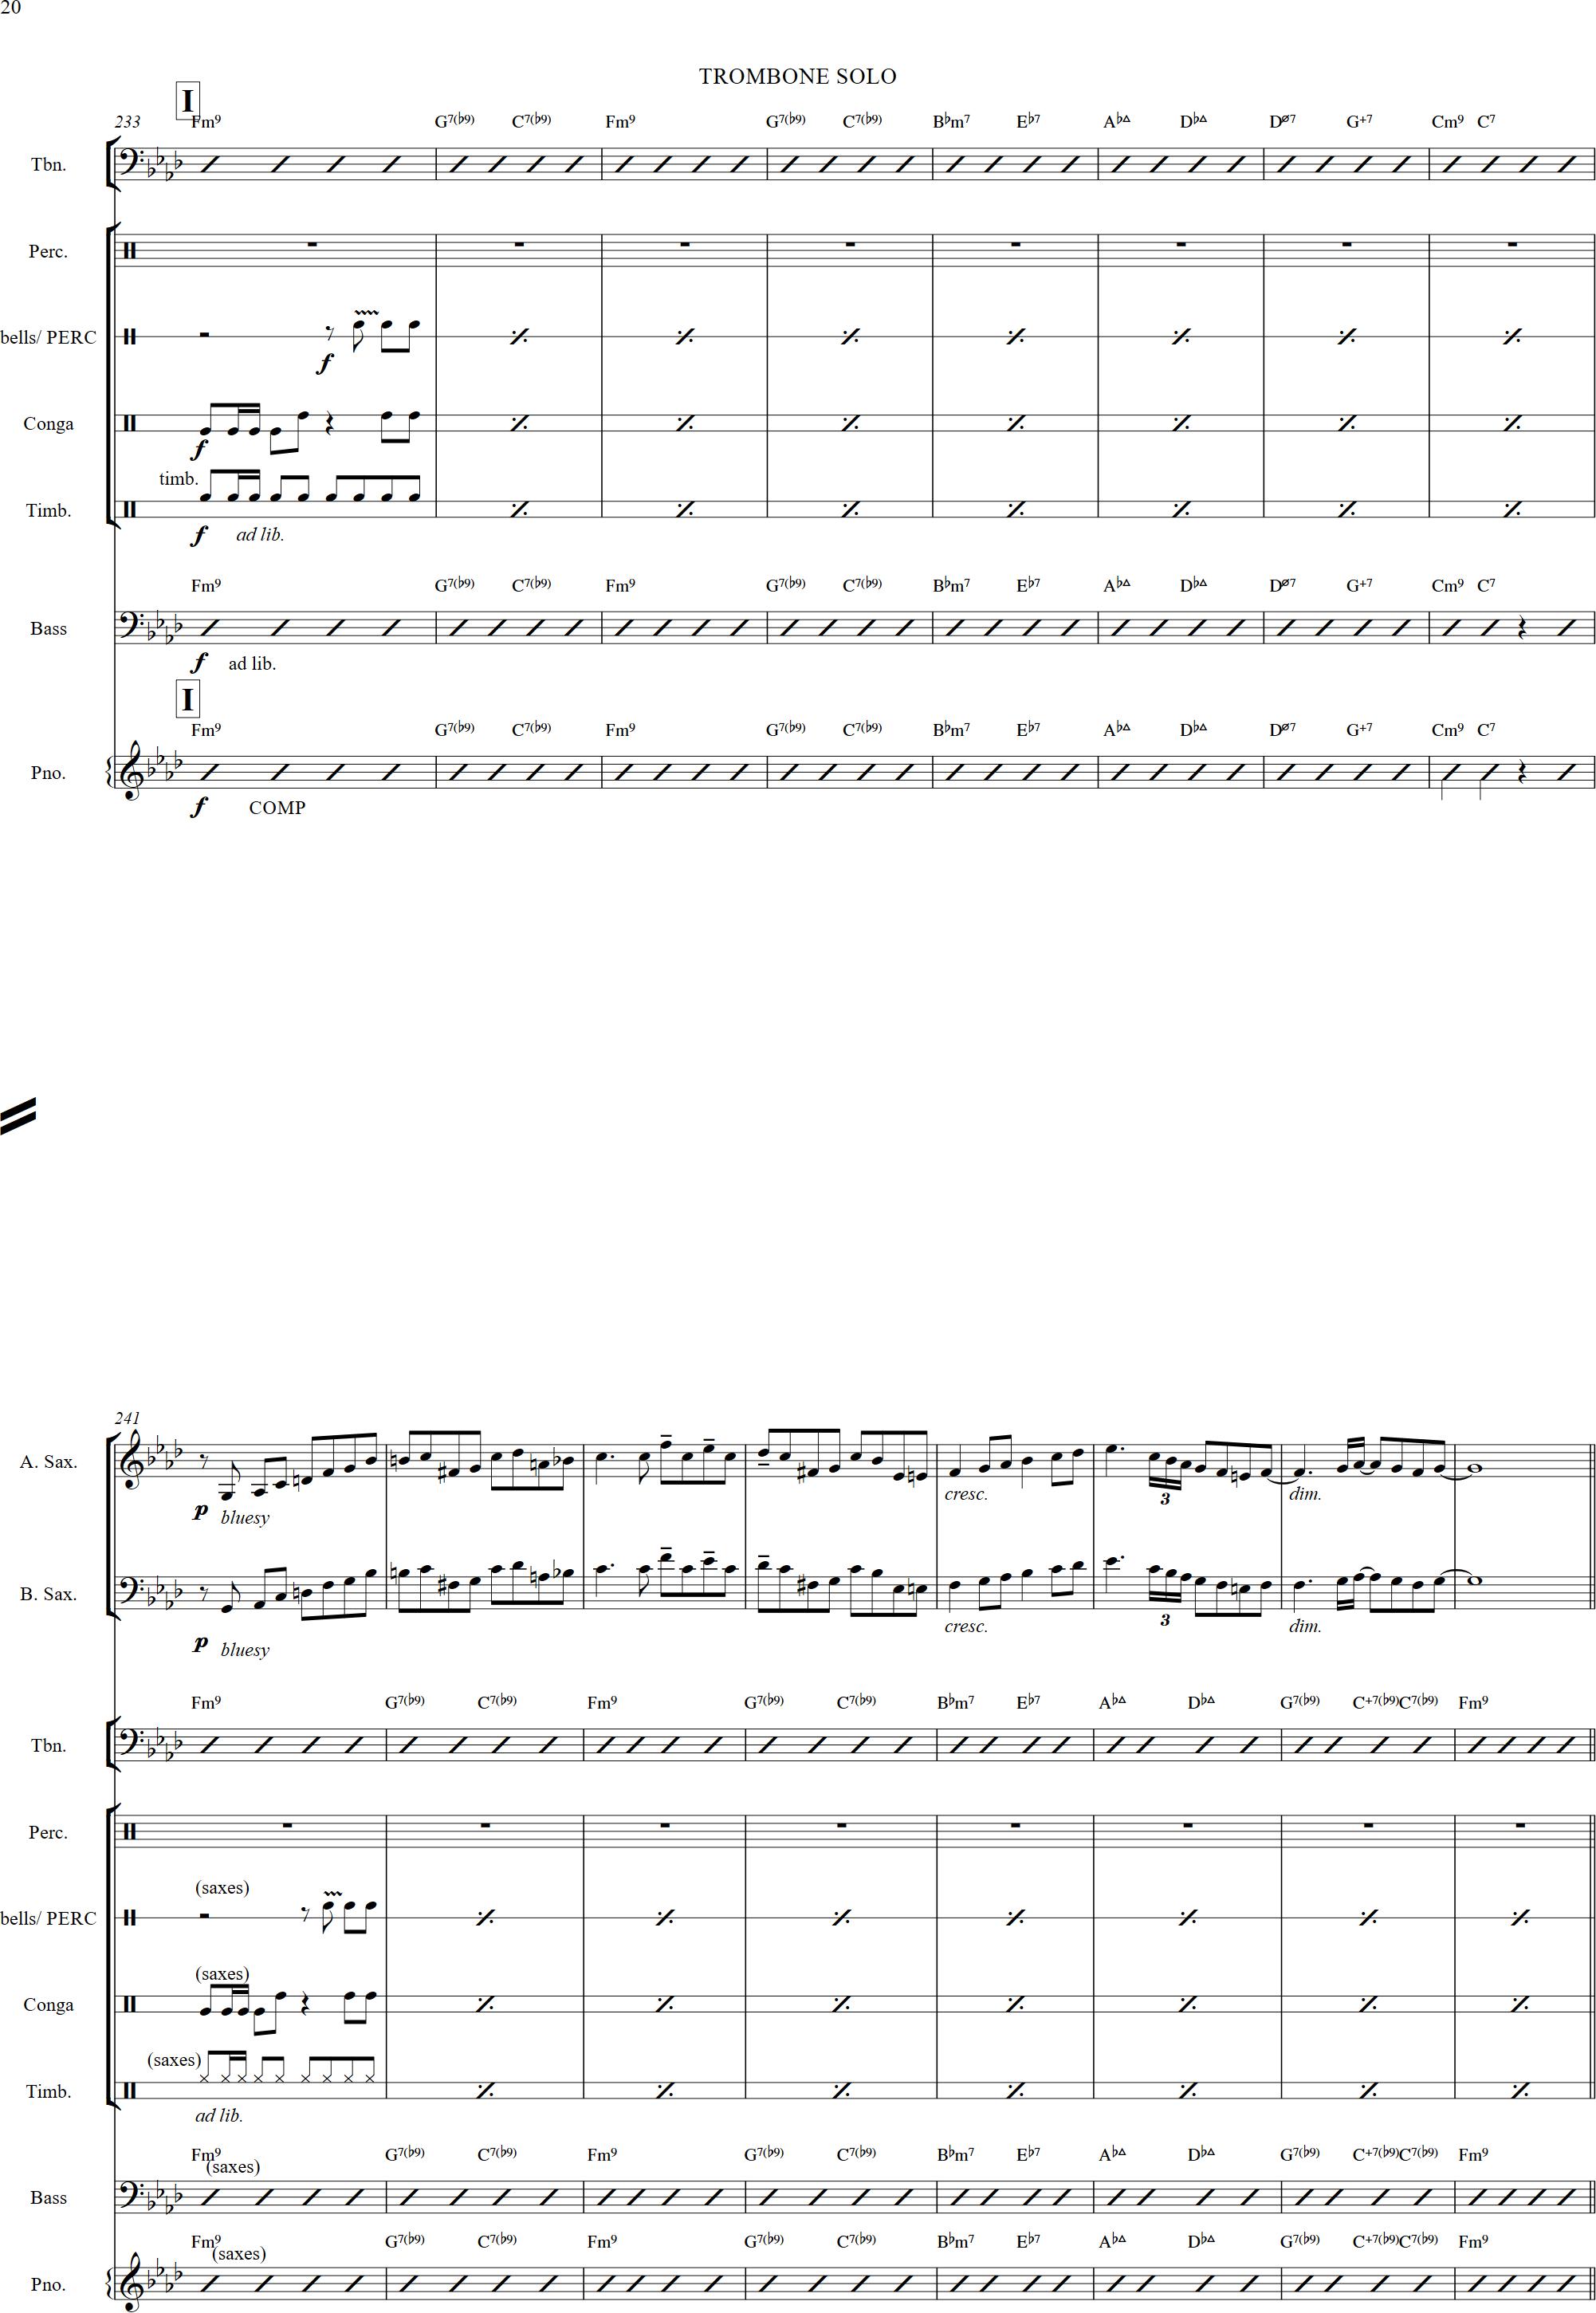 rumba riff new_0020.png